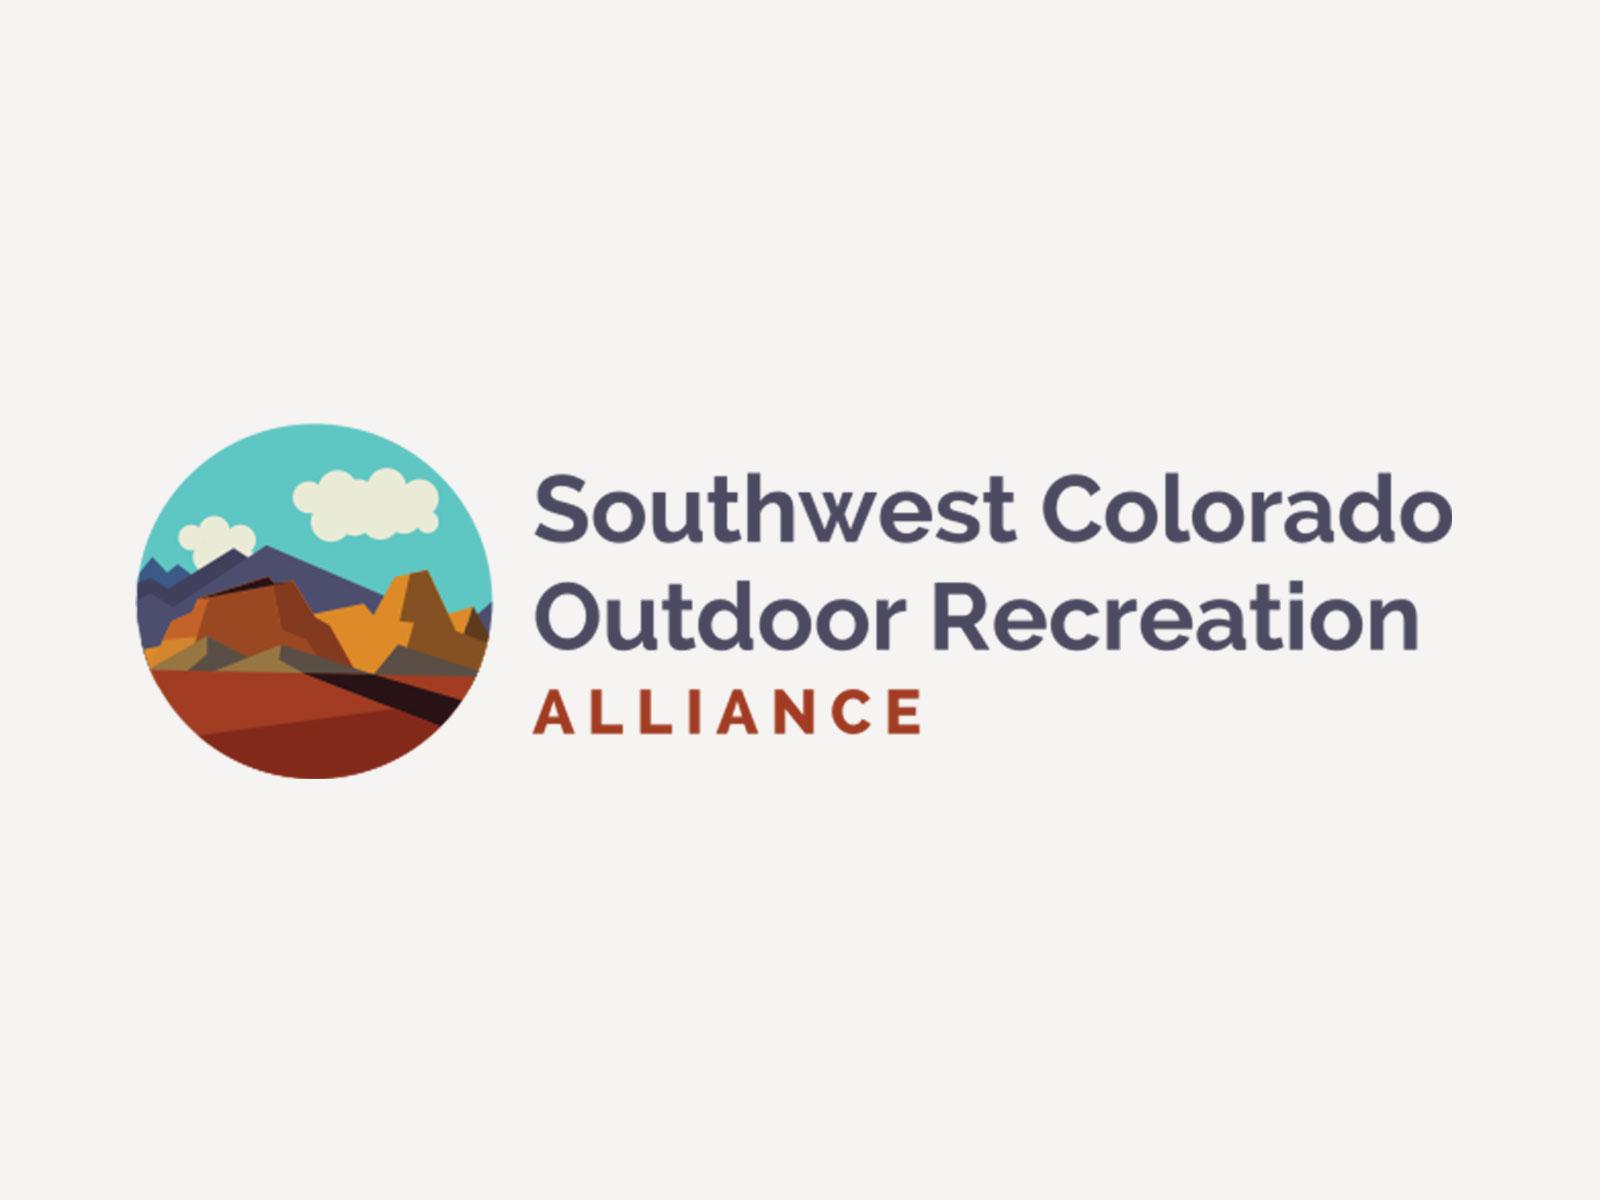 Southwest Colorado Outdoor Recreation Alliance logo and website